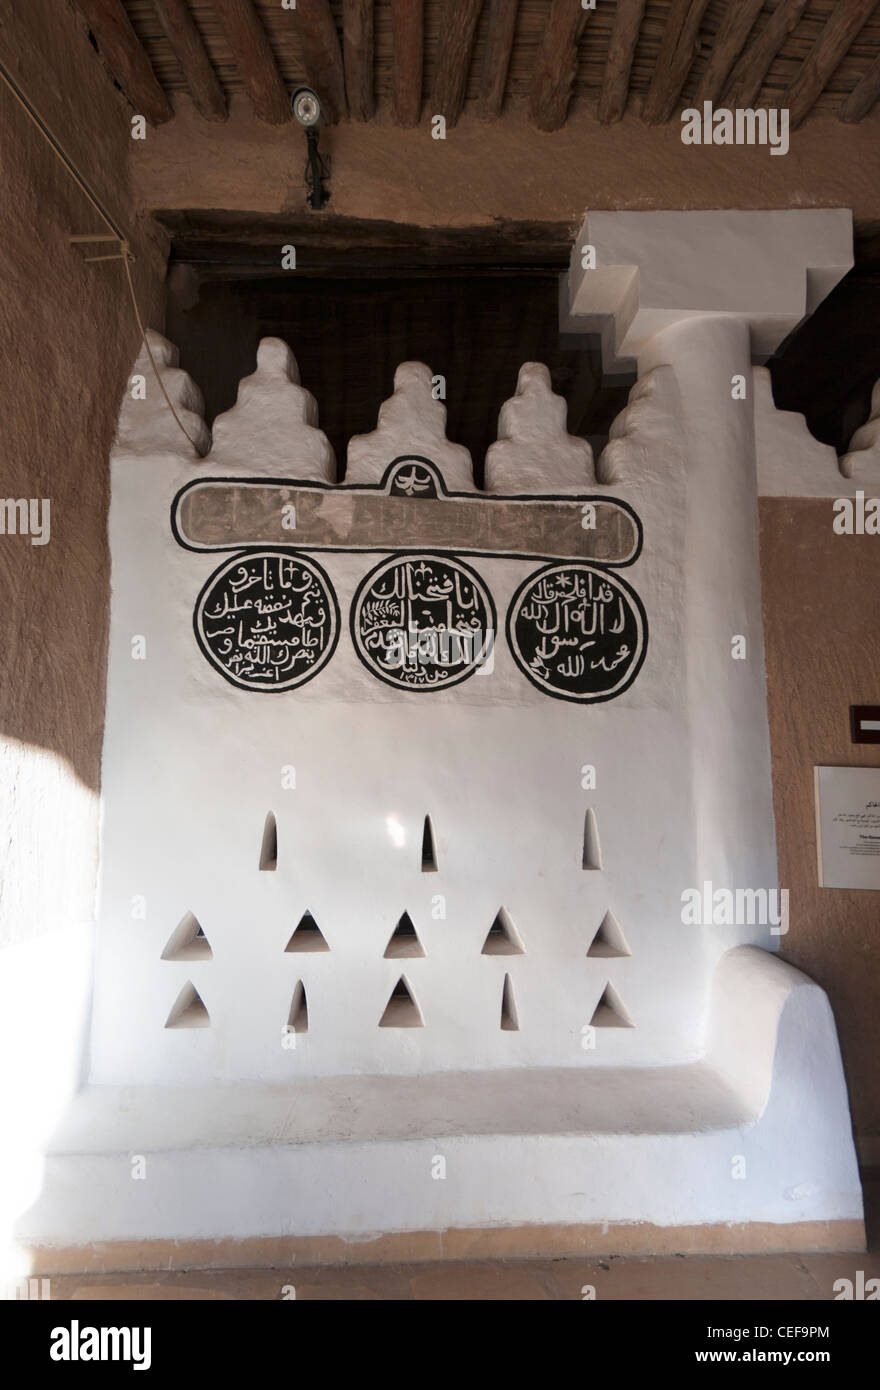 arabic inscription detail in Al Masmak fort, Riyadh, Saudi Arabia - Stock Image